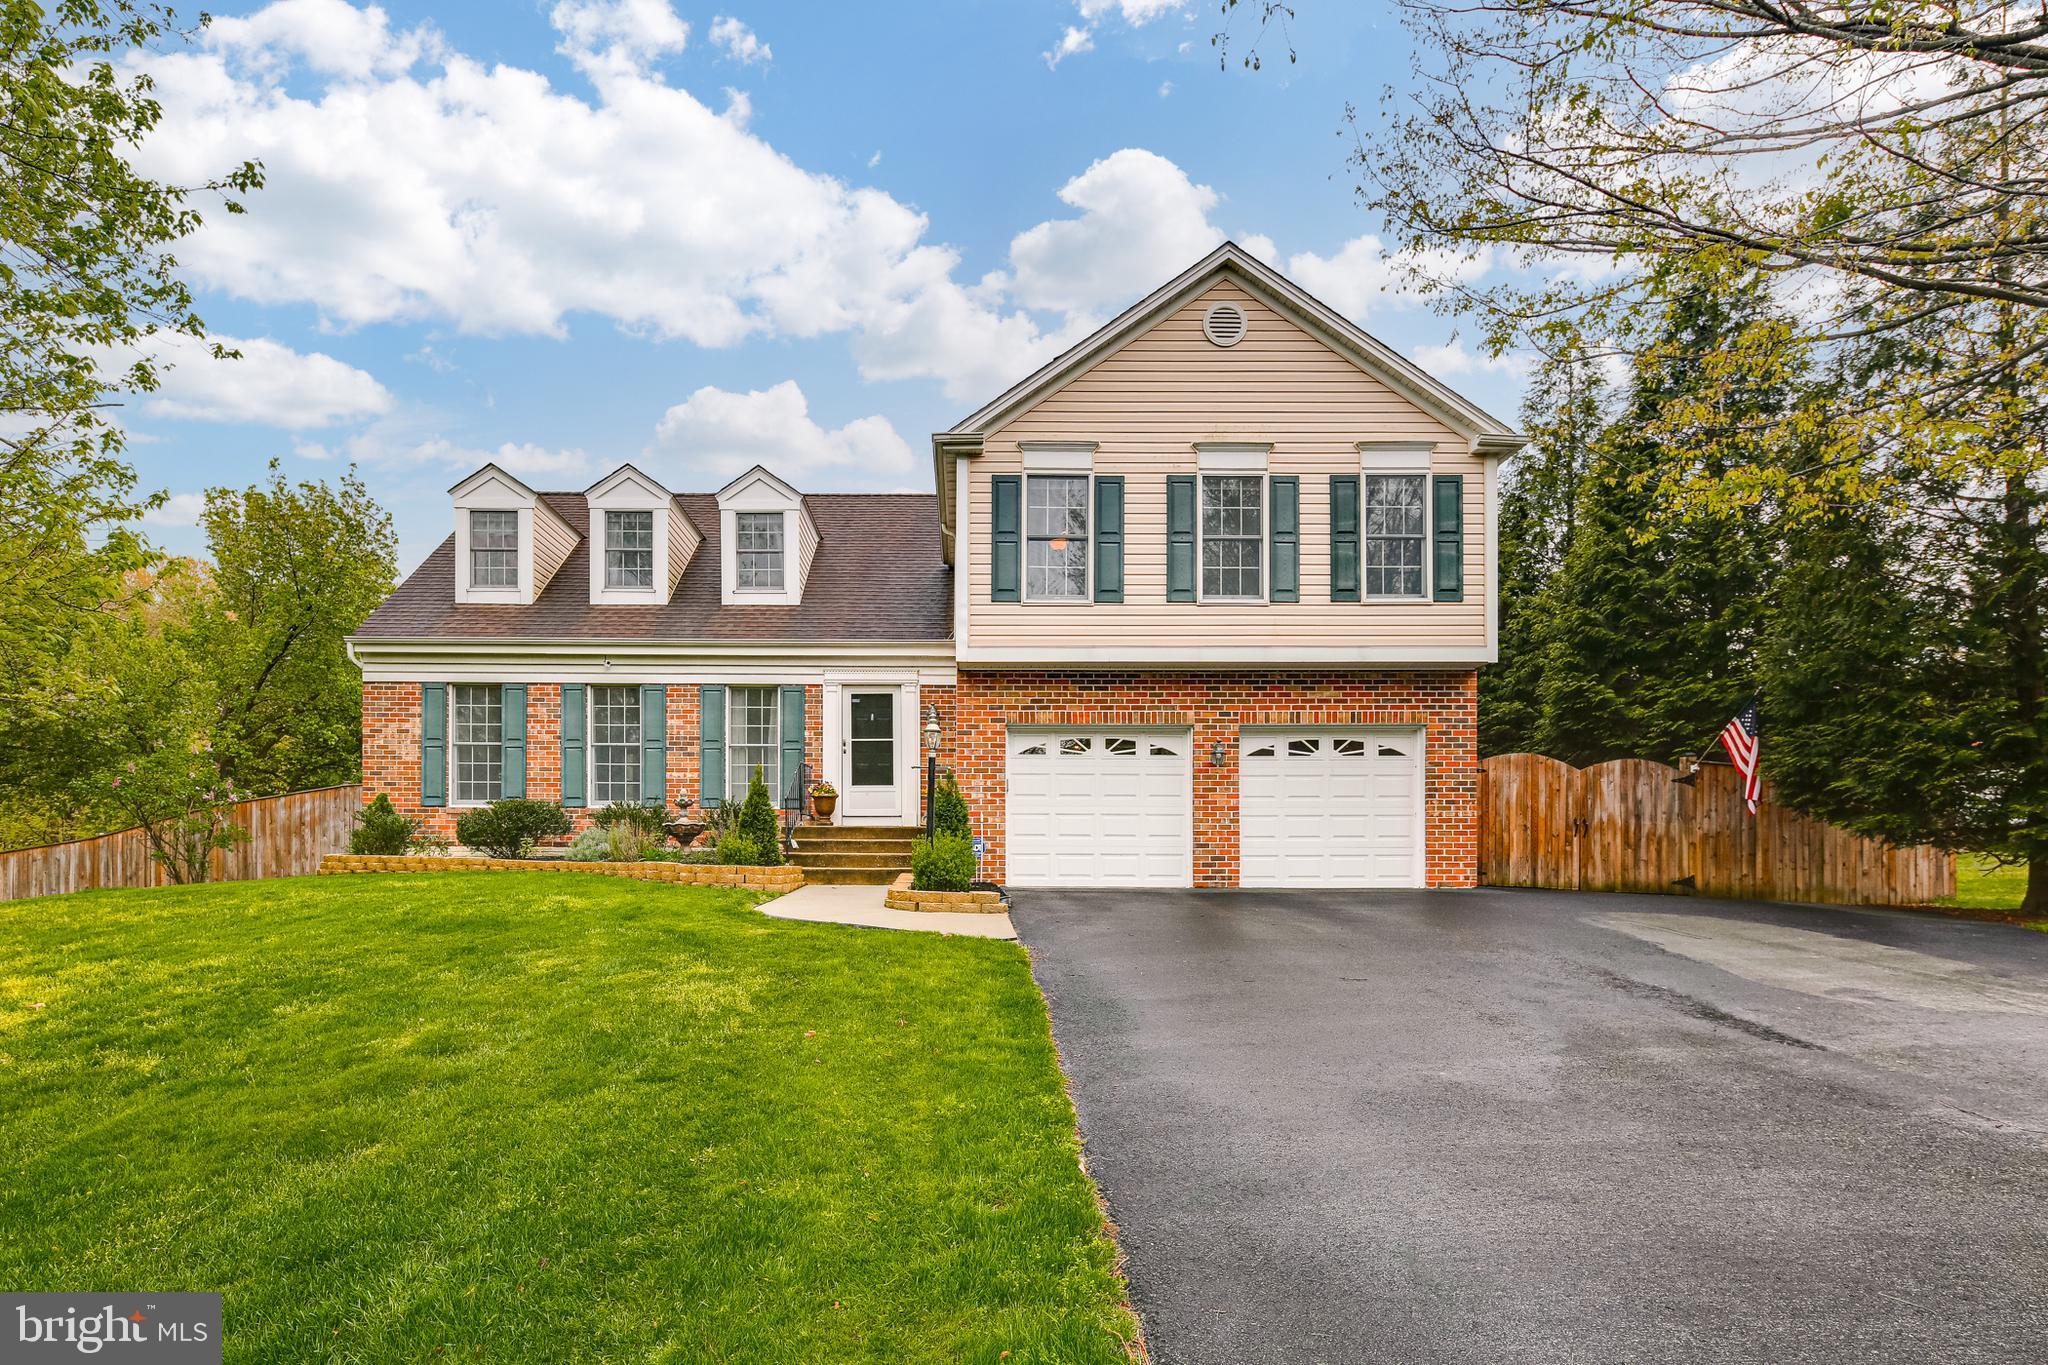 1301 REDMORE COURT, SEVERN, Maryland 21144, 4 Bedrooms Bedrooms, ,3 BathroomsBathrooms,Single Family,For Sale,1301 REDMORE COURT,MDAA464850